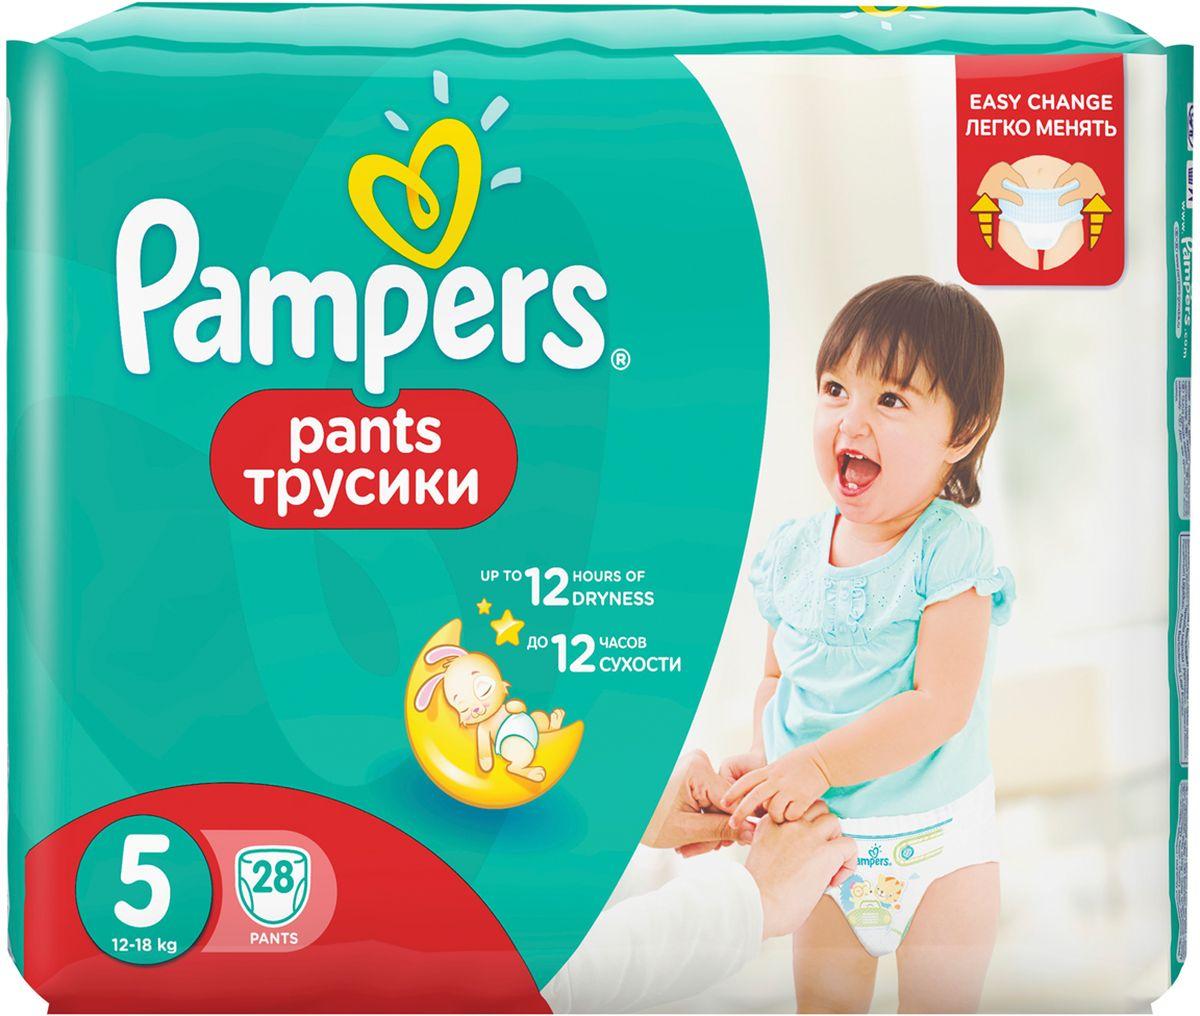 Pampers Подгузники-трусики Pants 12-18 кг 28 шт